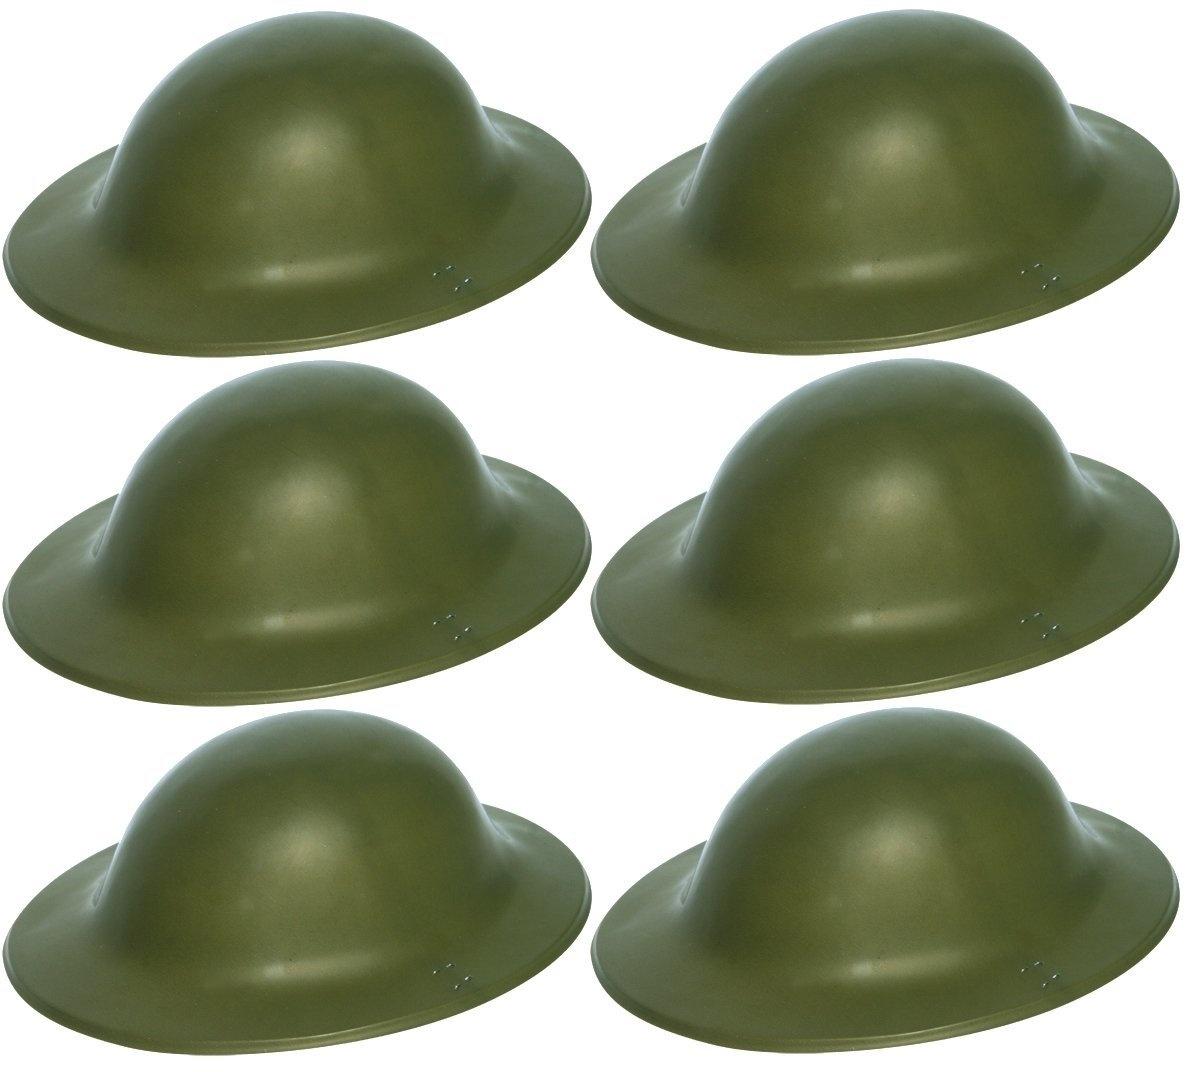 dc56d77d088 Plastic Army Helmet Toys  Buy Online from Fishpond.com.au